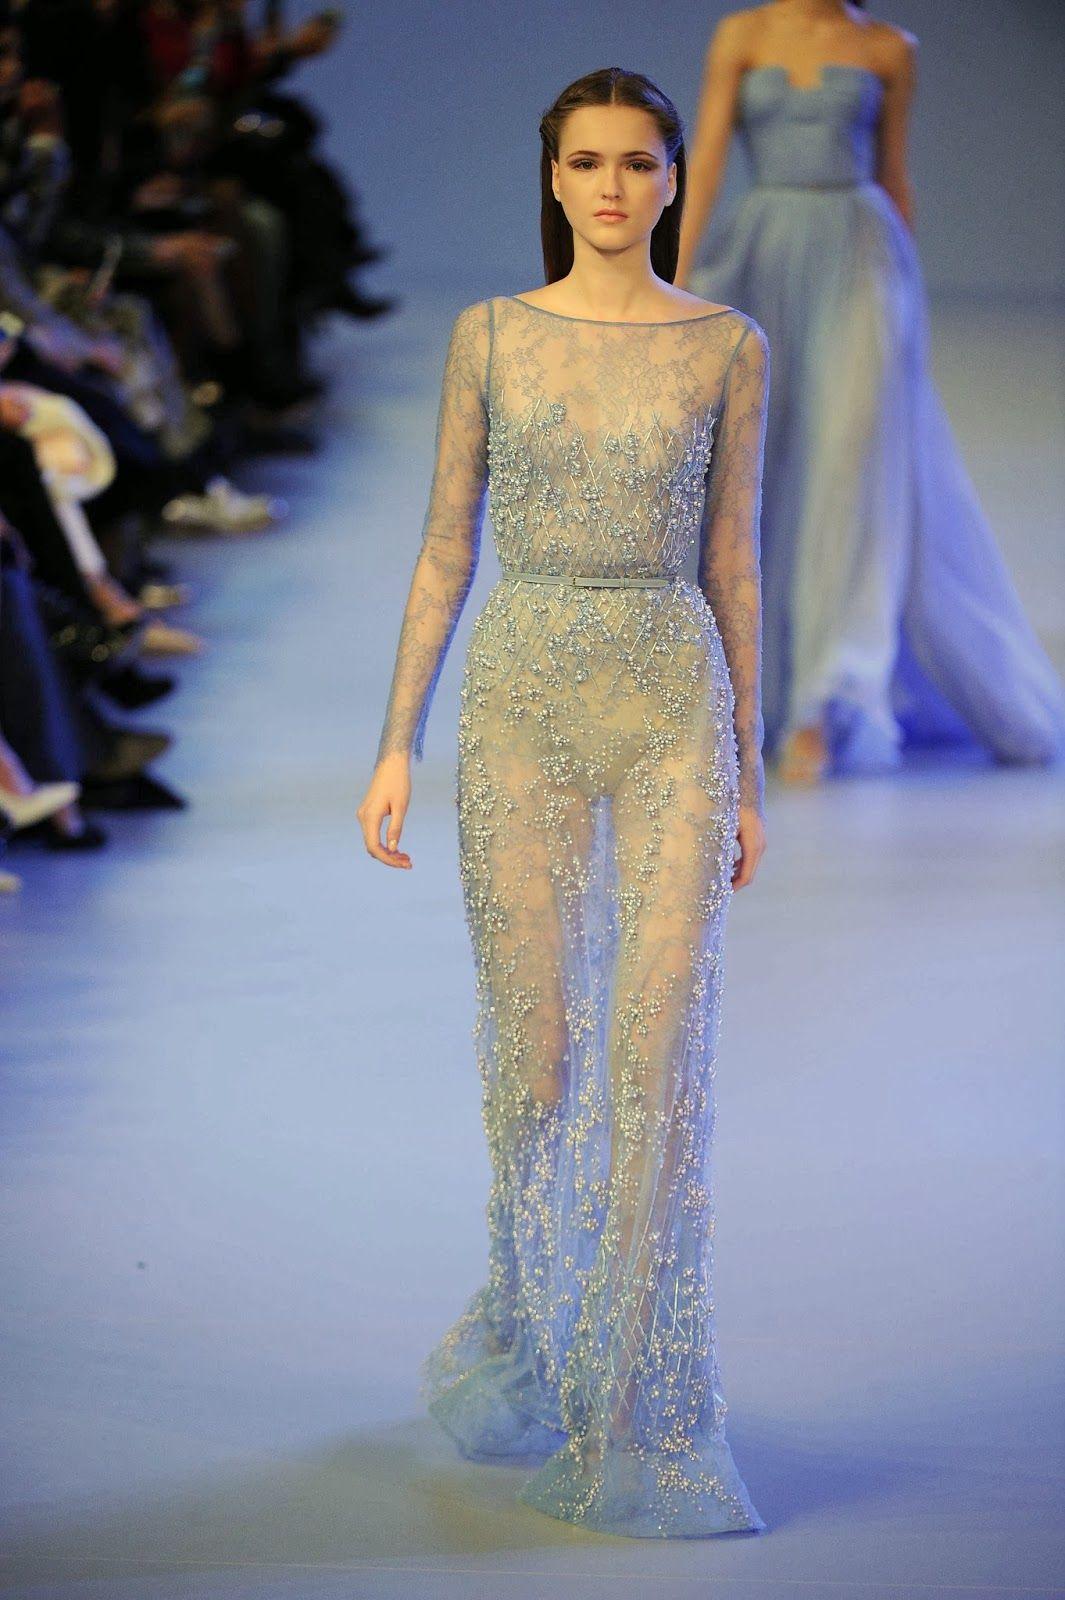 Amore beauty fashion wedding bell wednesday elie saab